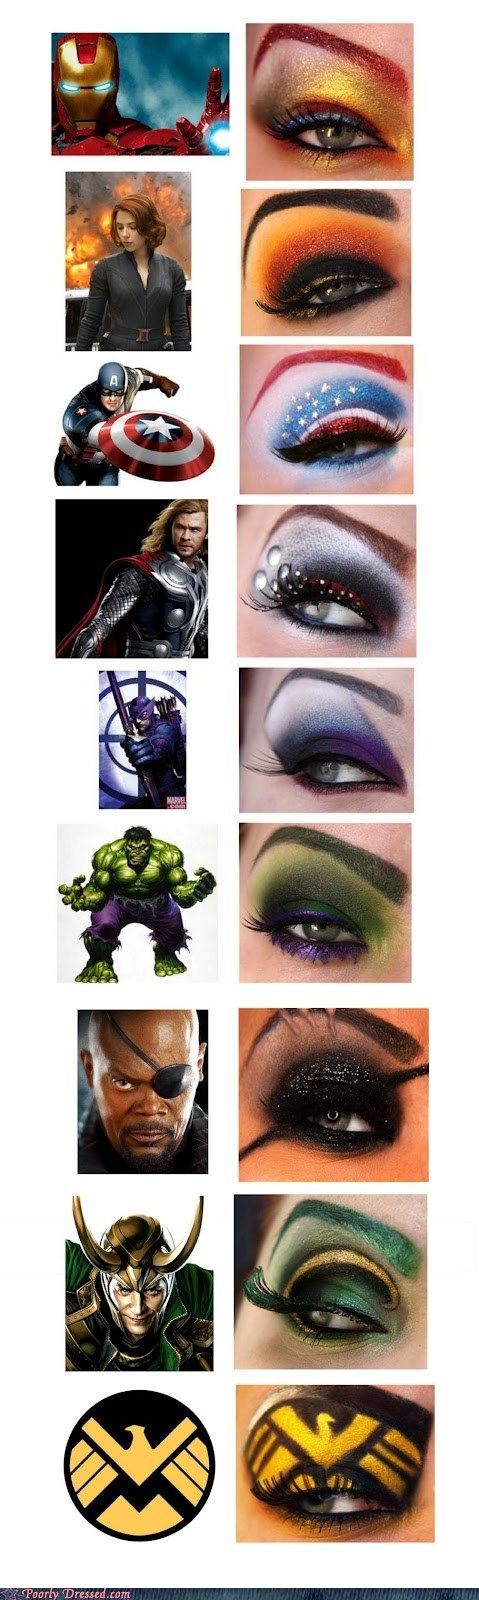 eyeshadowAvengers Eye, Eye Makeup, Eye Shadows, Makeup Ideas, Eyeshadows, Super Heroes, Eyemakeup, The Avengers, Superhero